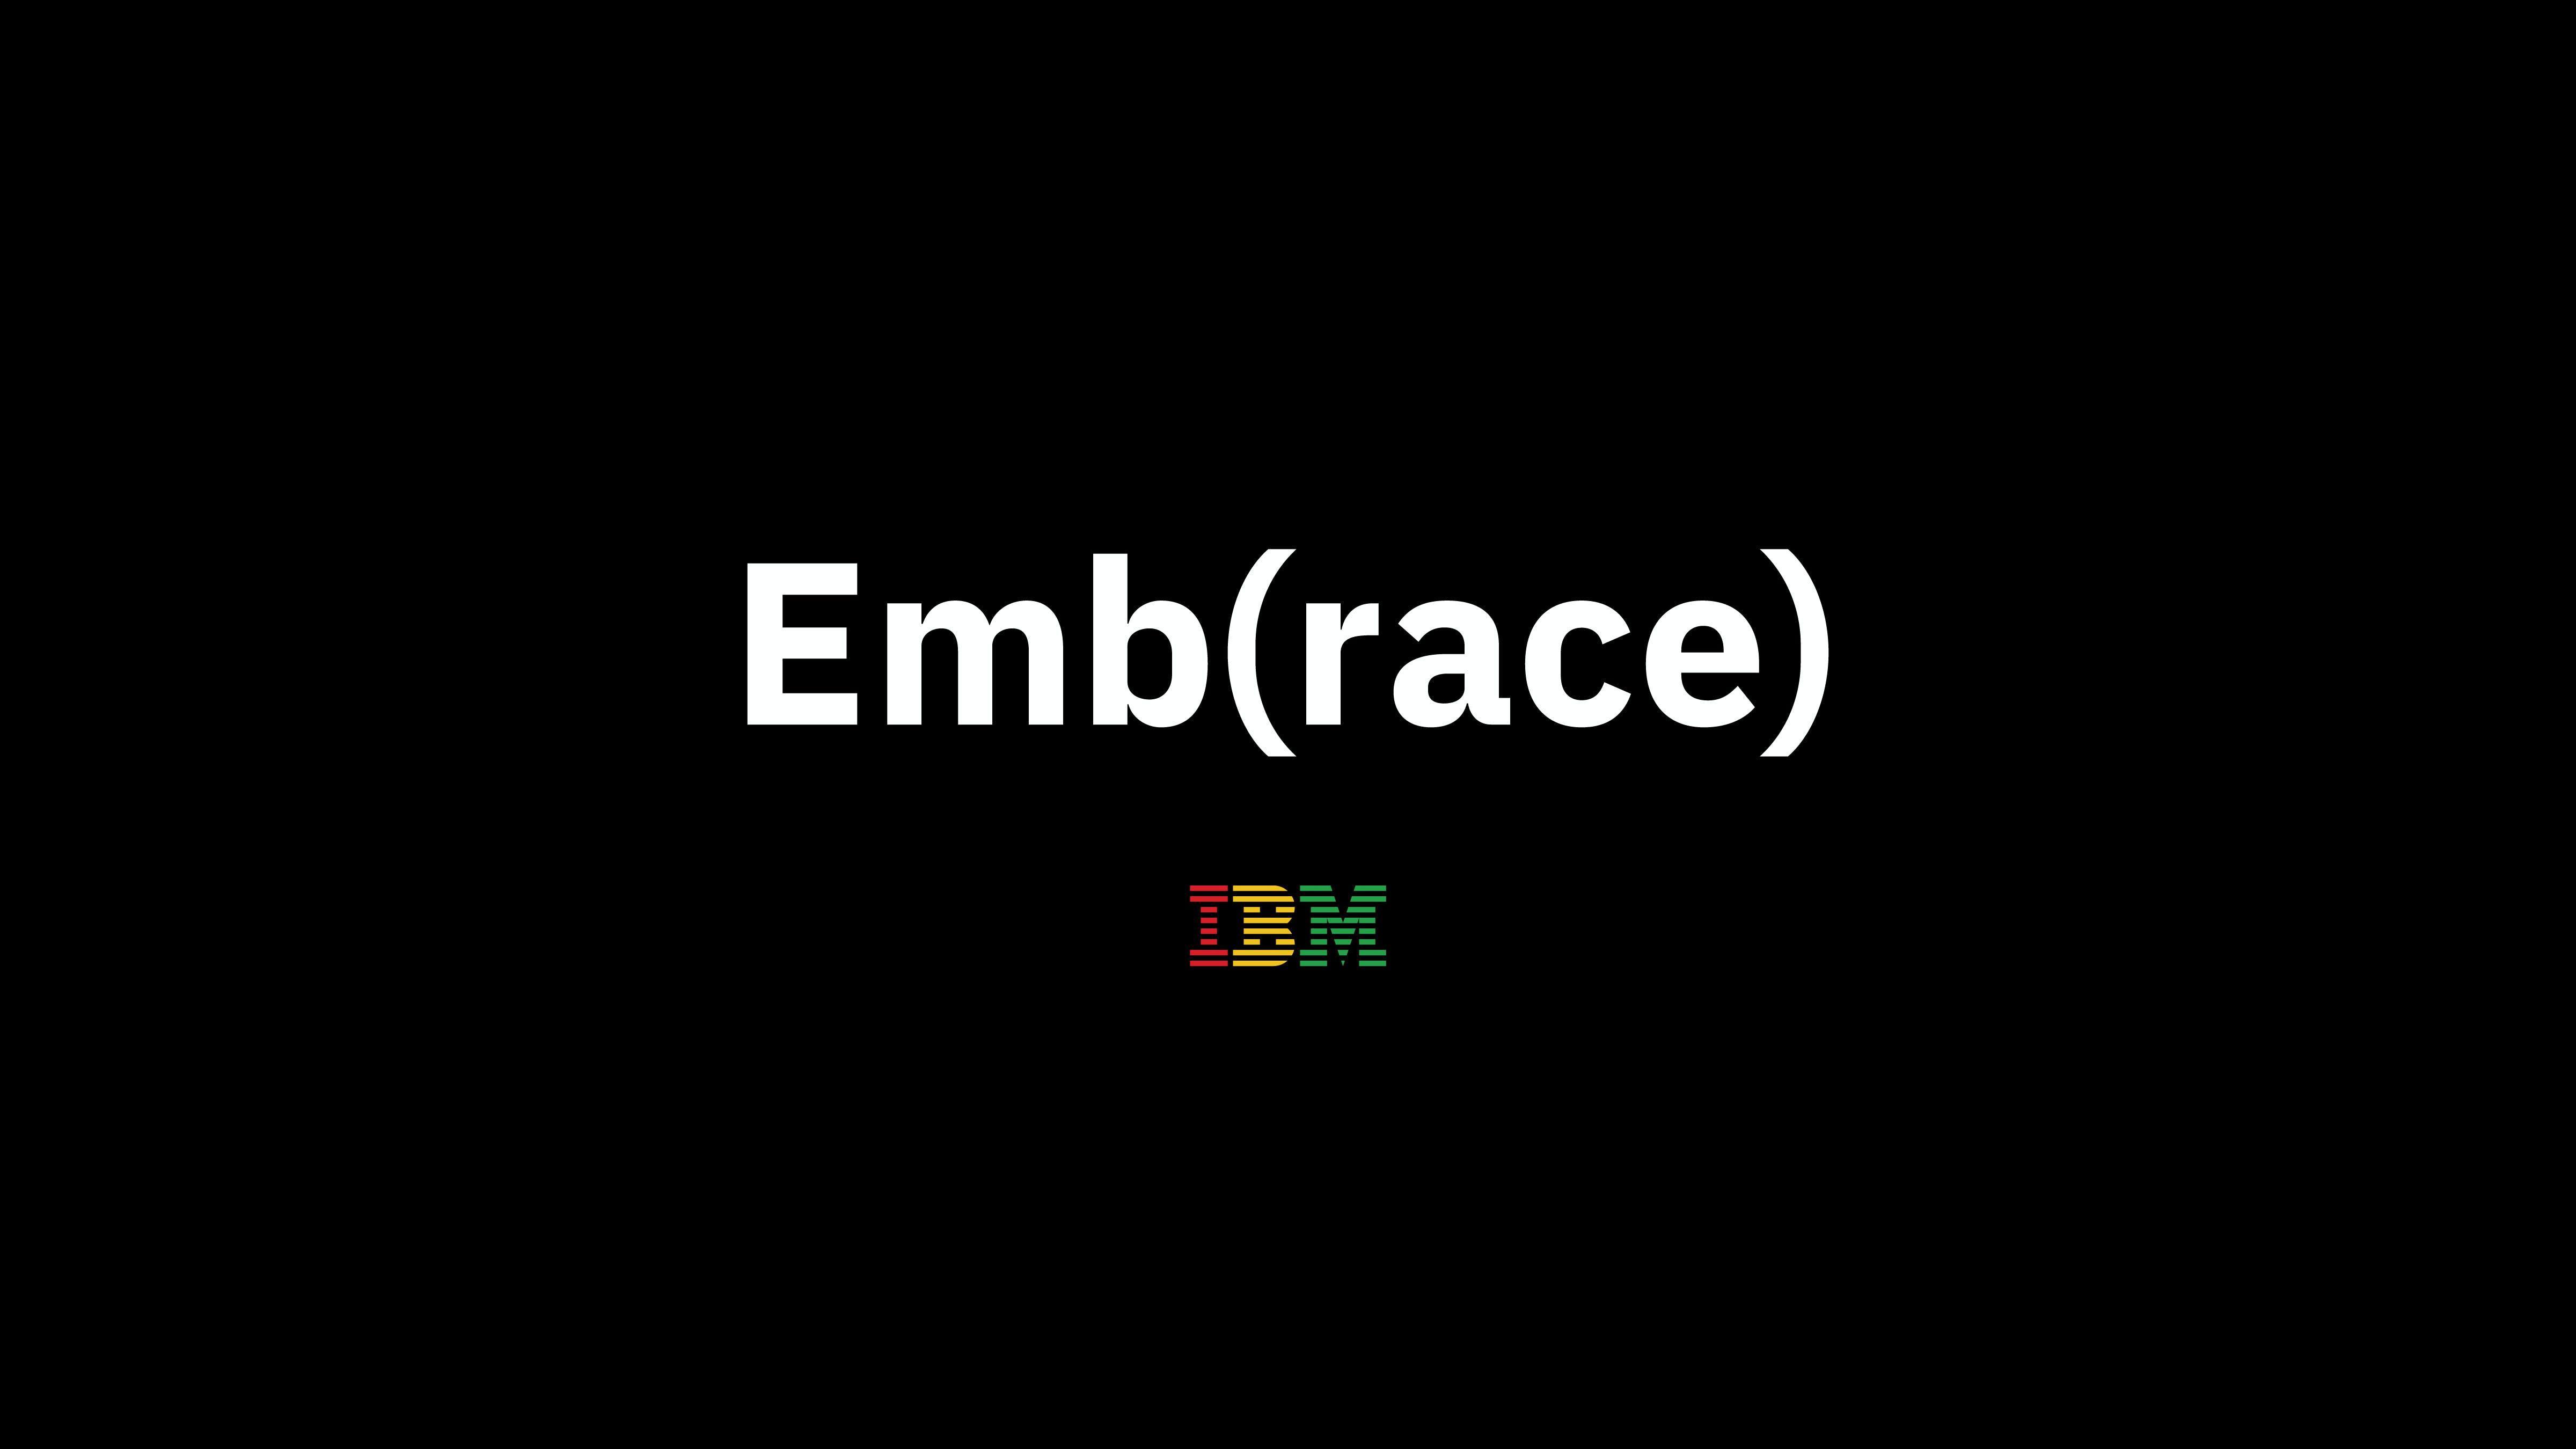 White text on black background reading Emb(race), IBM